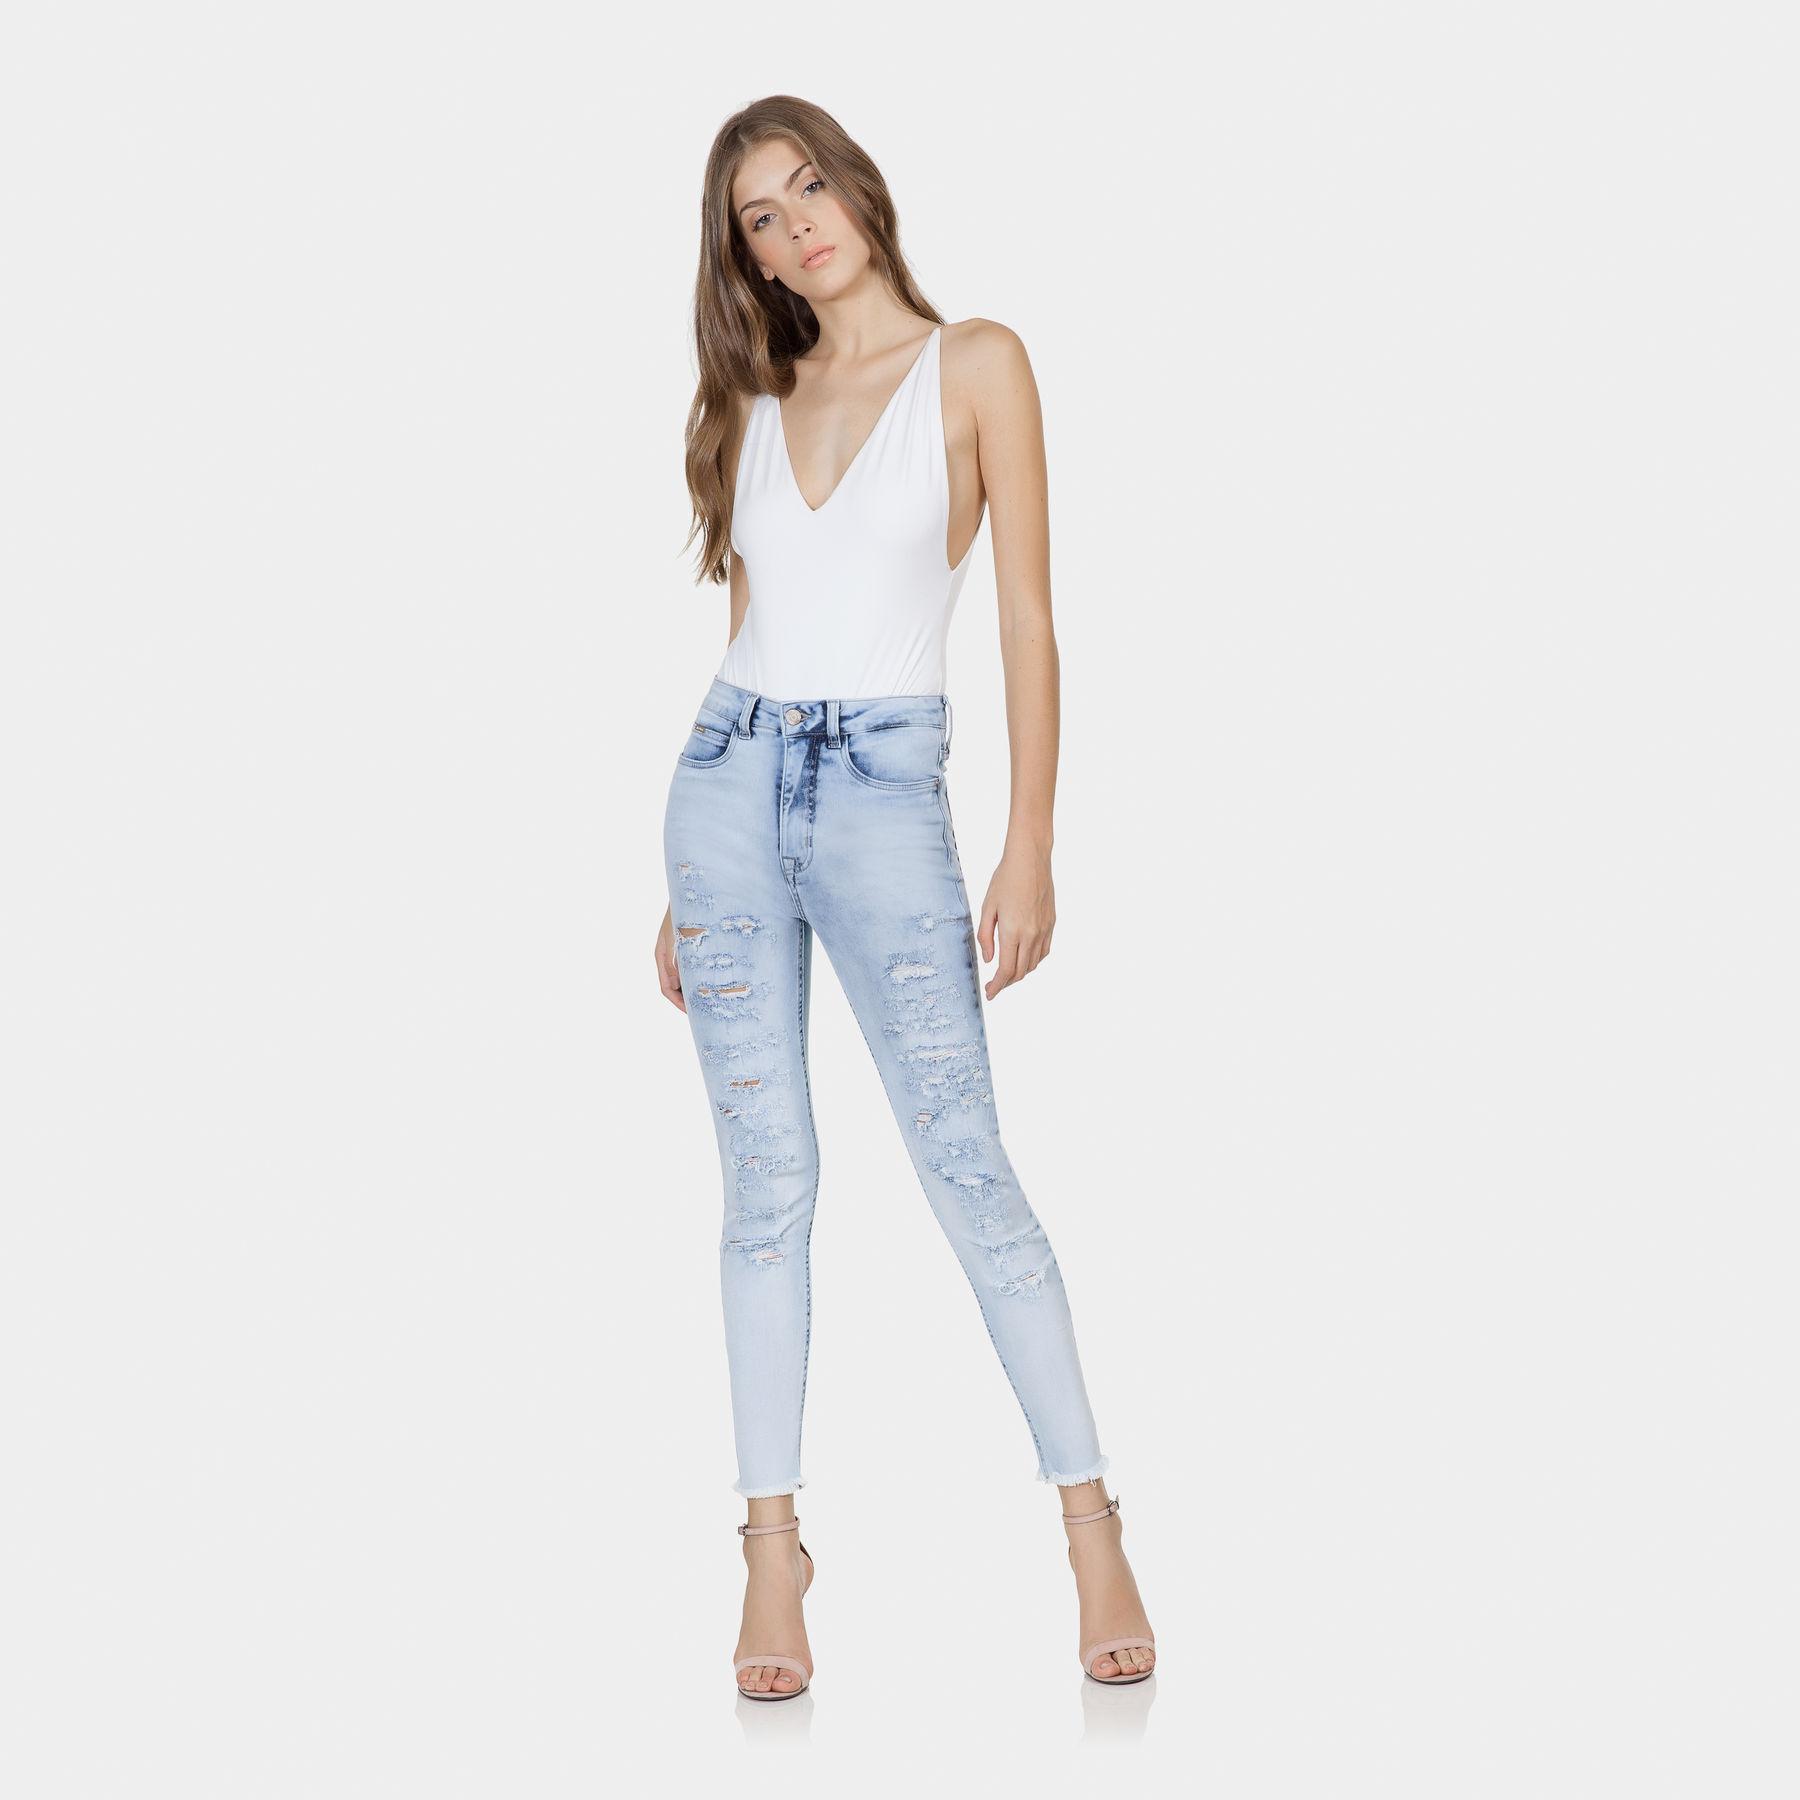 a90c89f09 Calça Jeans Aruba Cropped Flat Belly Jeans - Lez a Lez